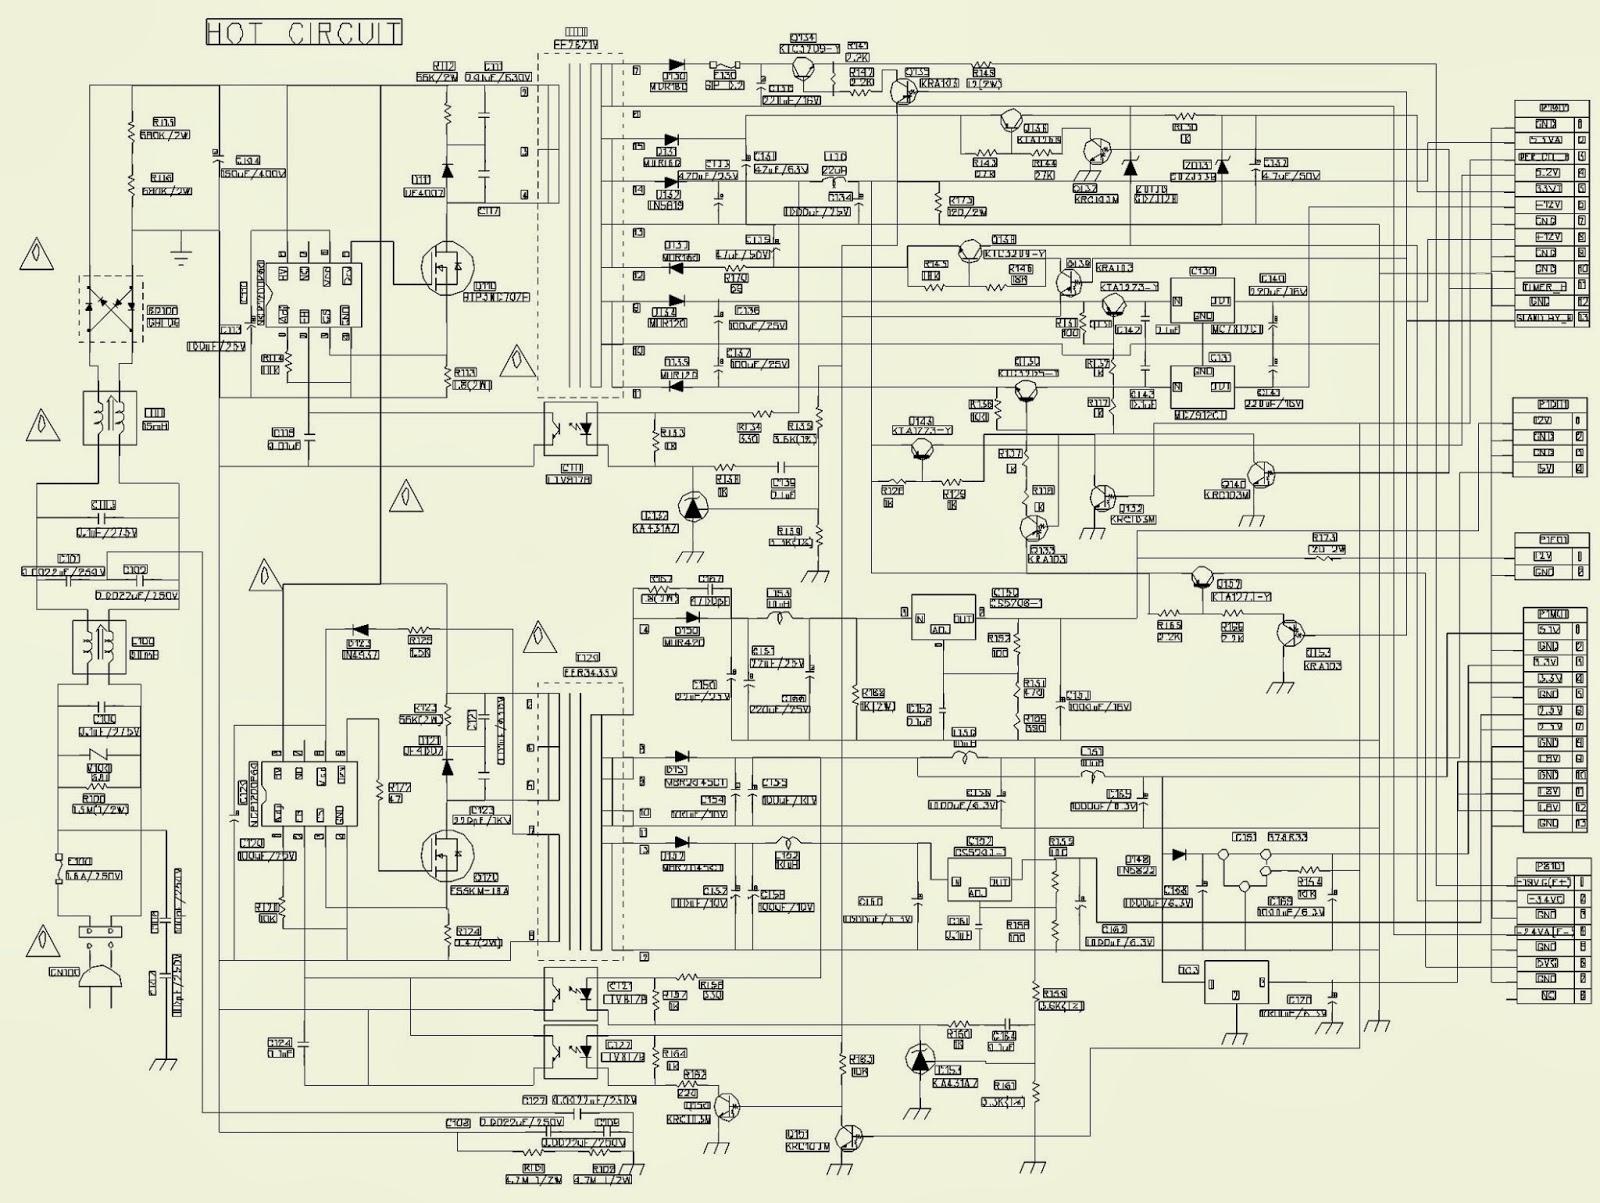 e55p dmr panasonic schematic diagram power supply board atx power supply schematic dvd recorder power supply repair - americas next top model ...